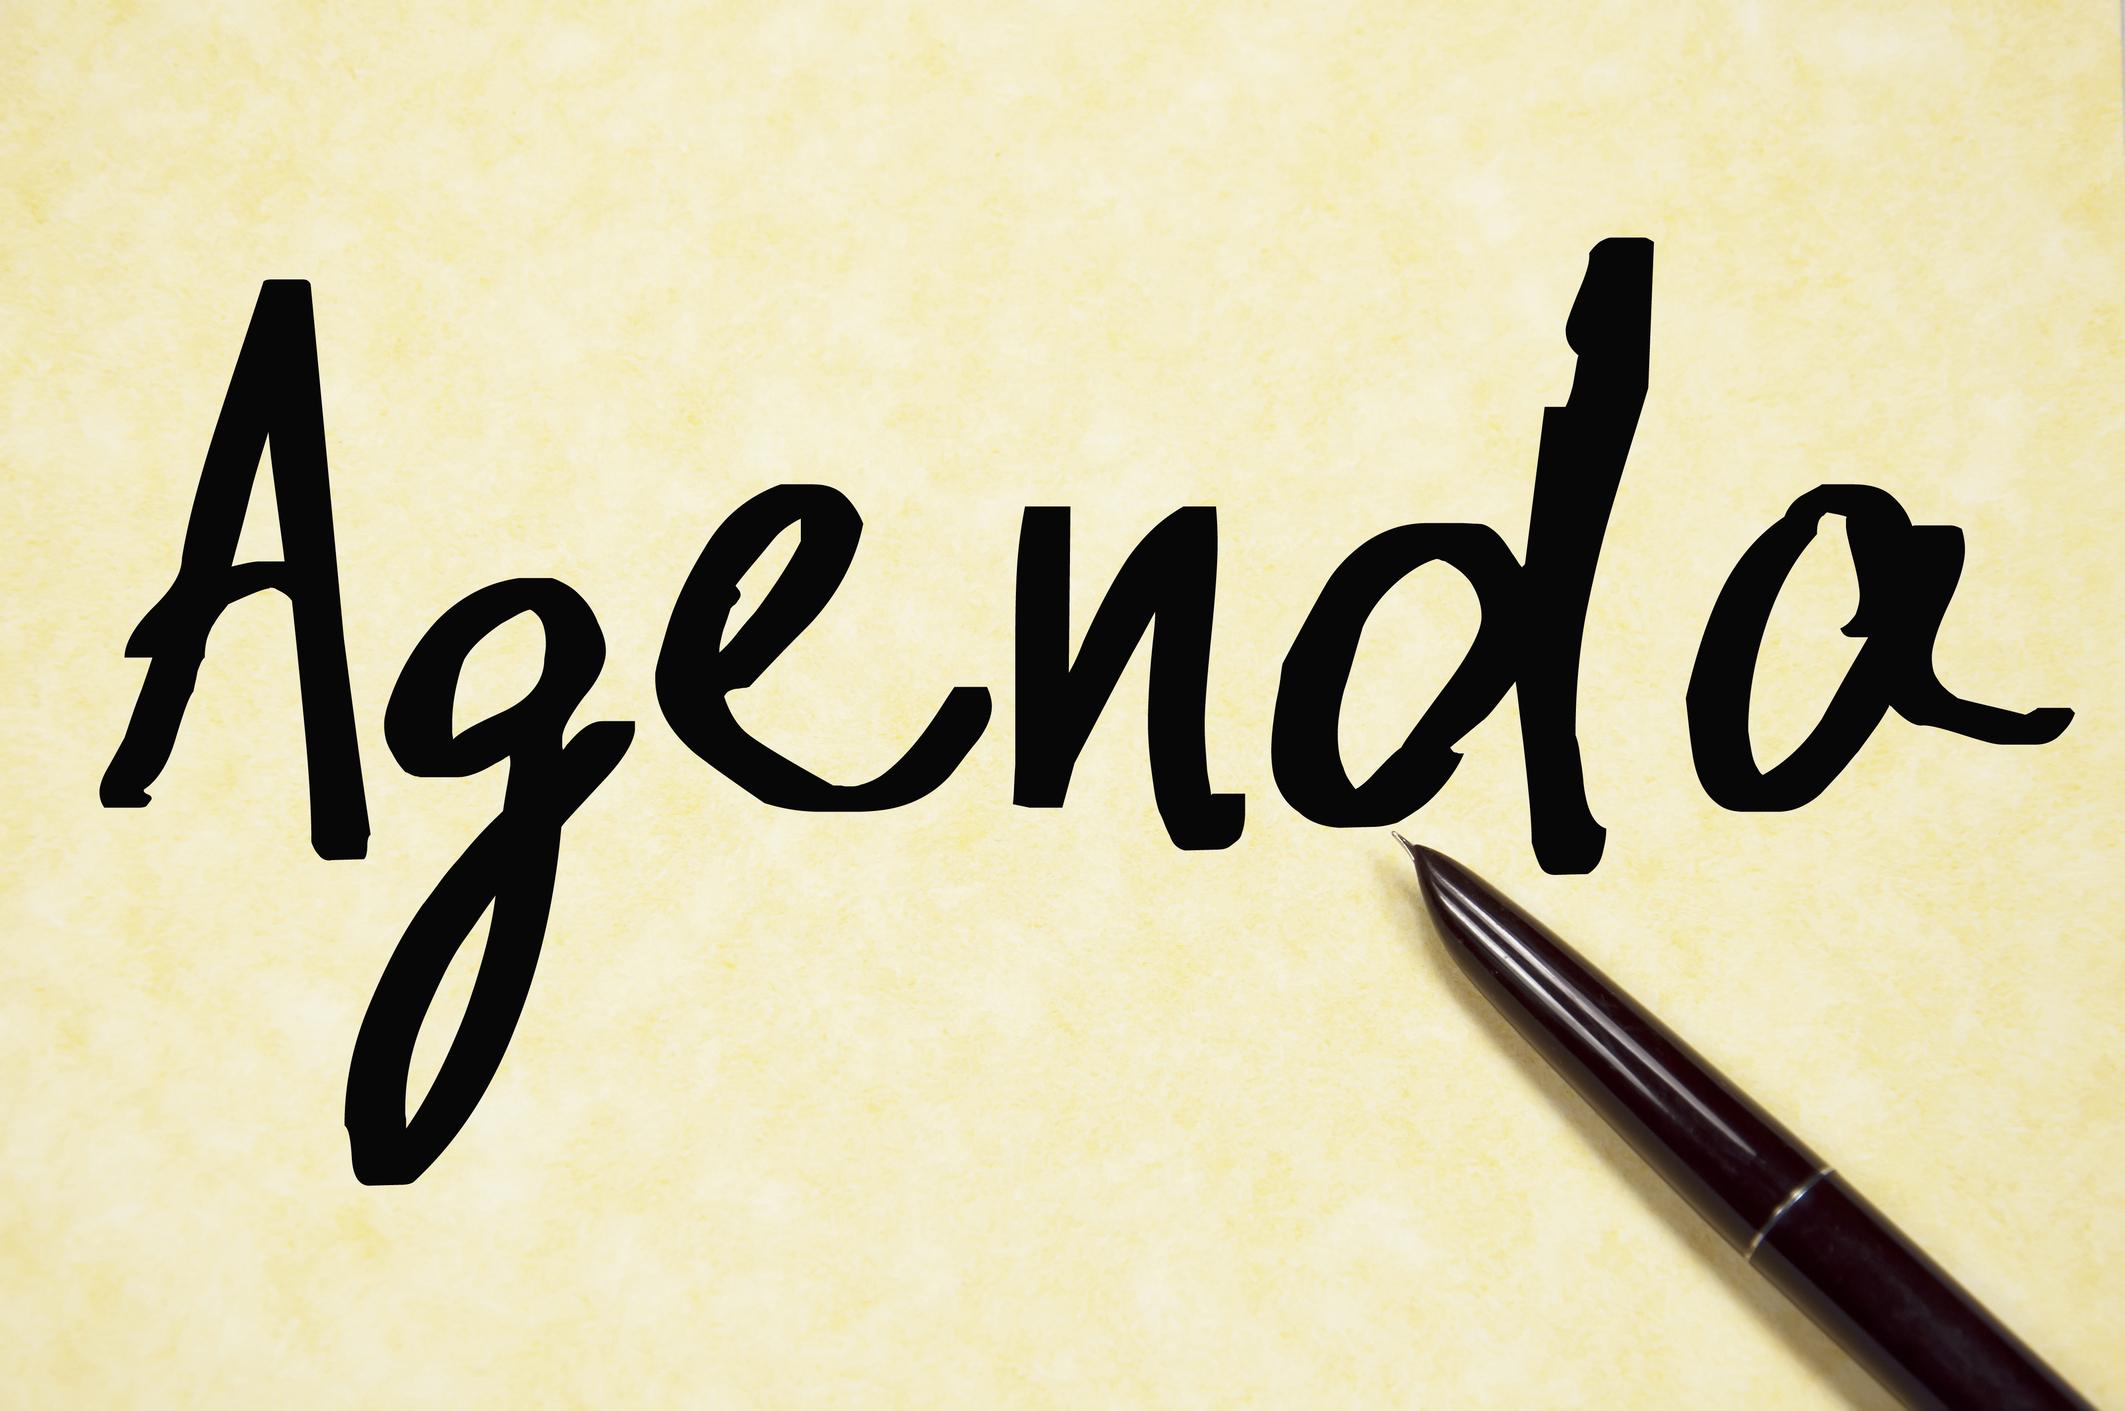 1-19-21 Planning Commission Agenda